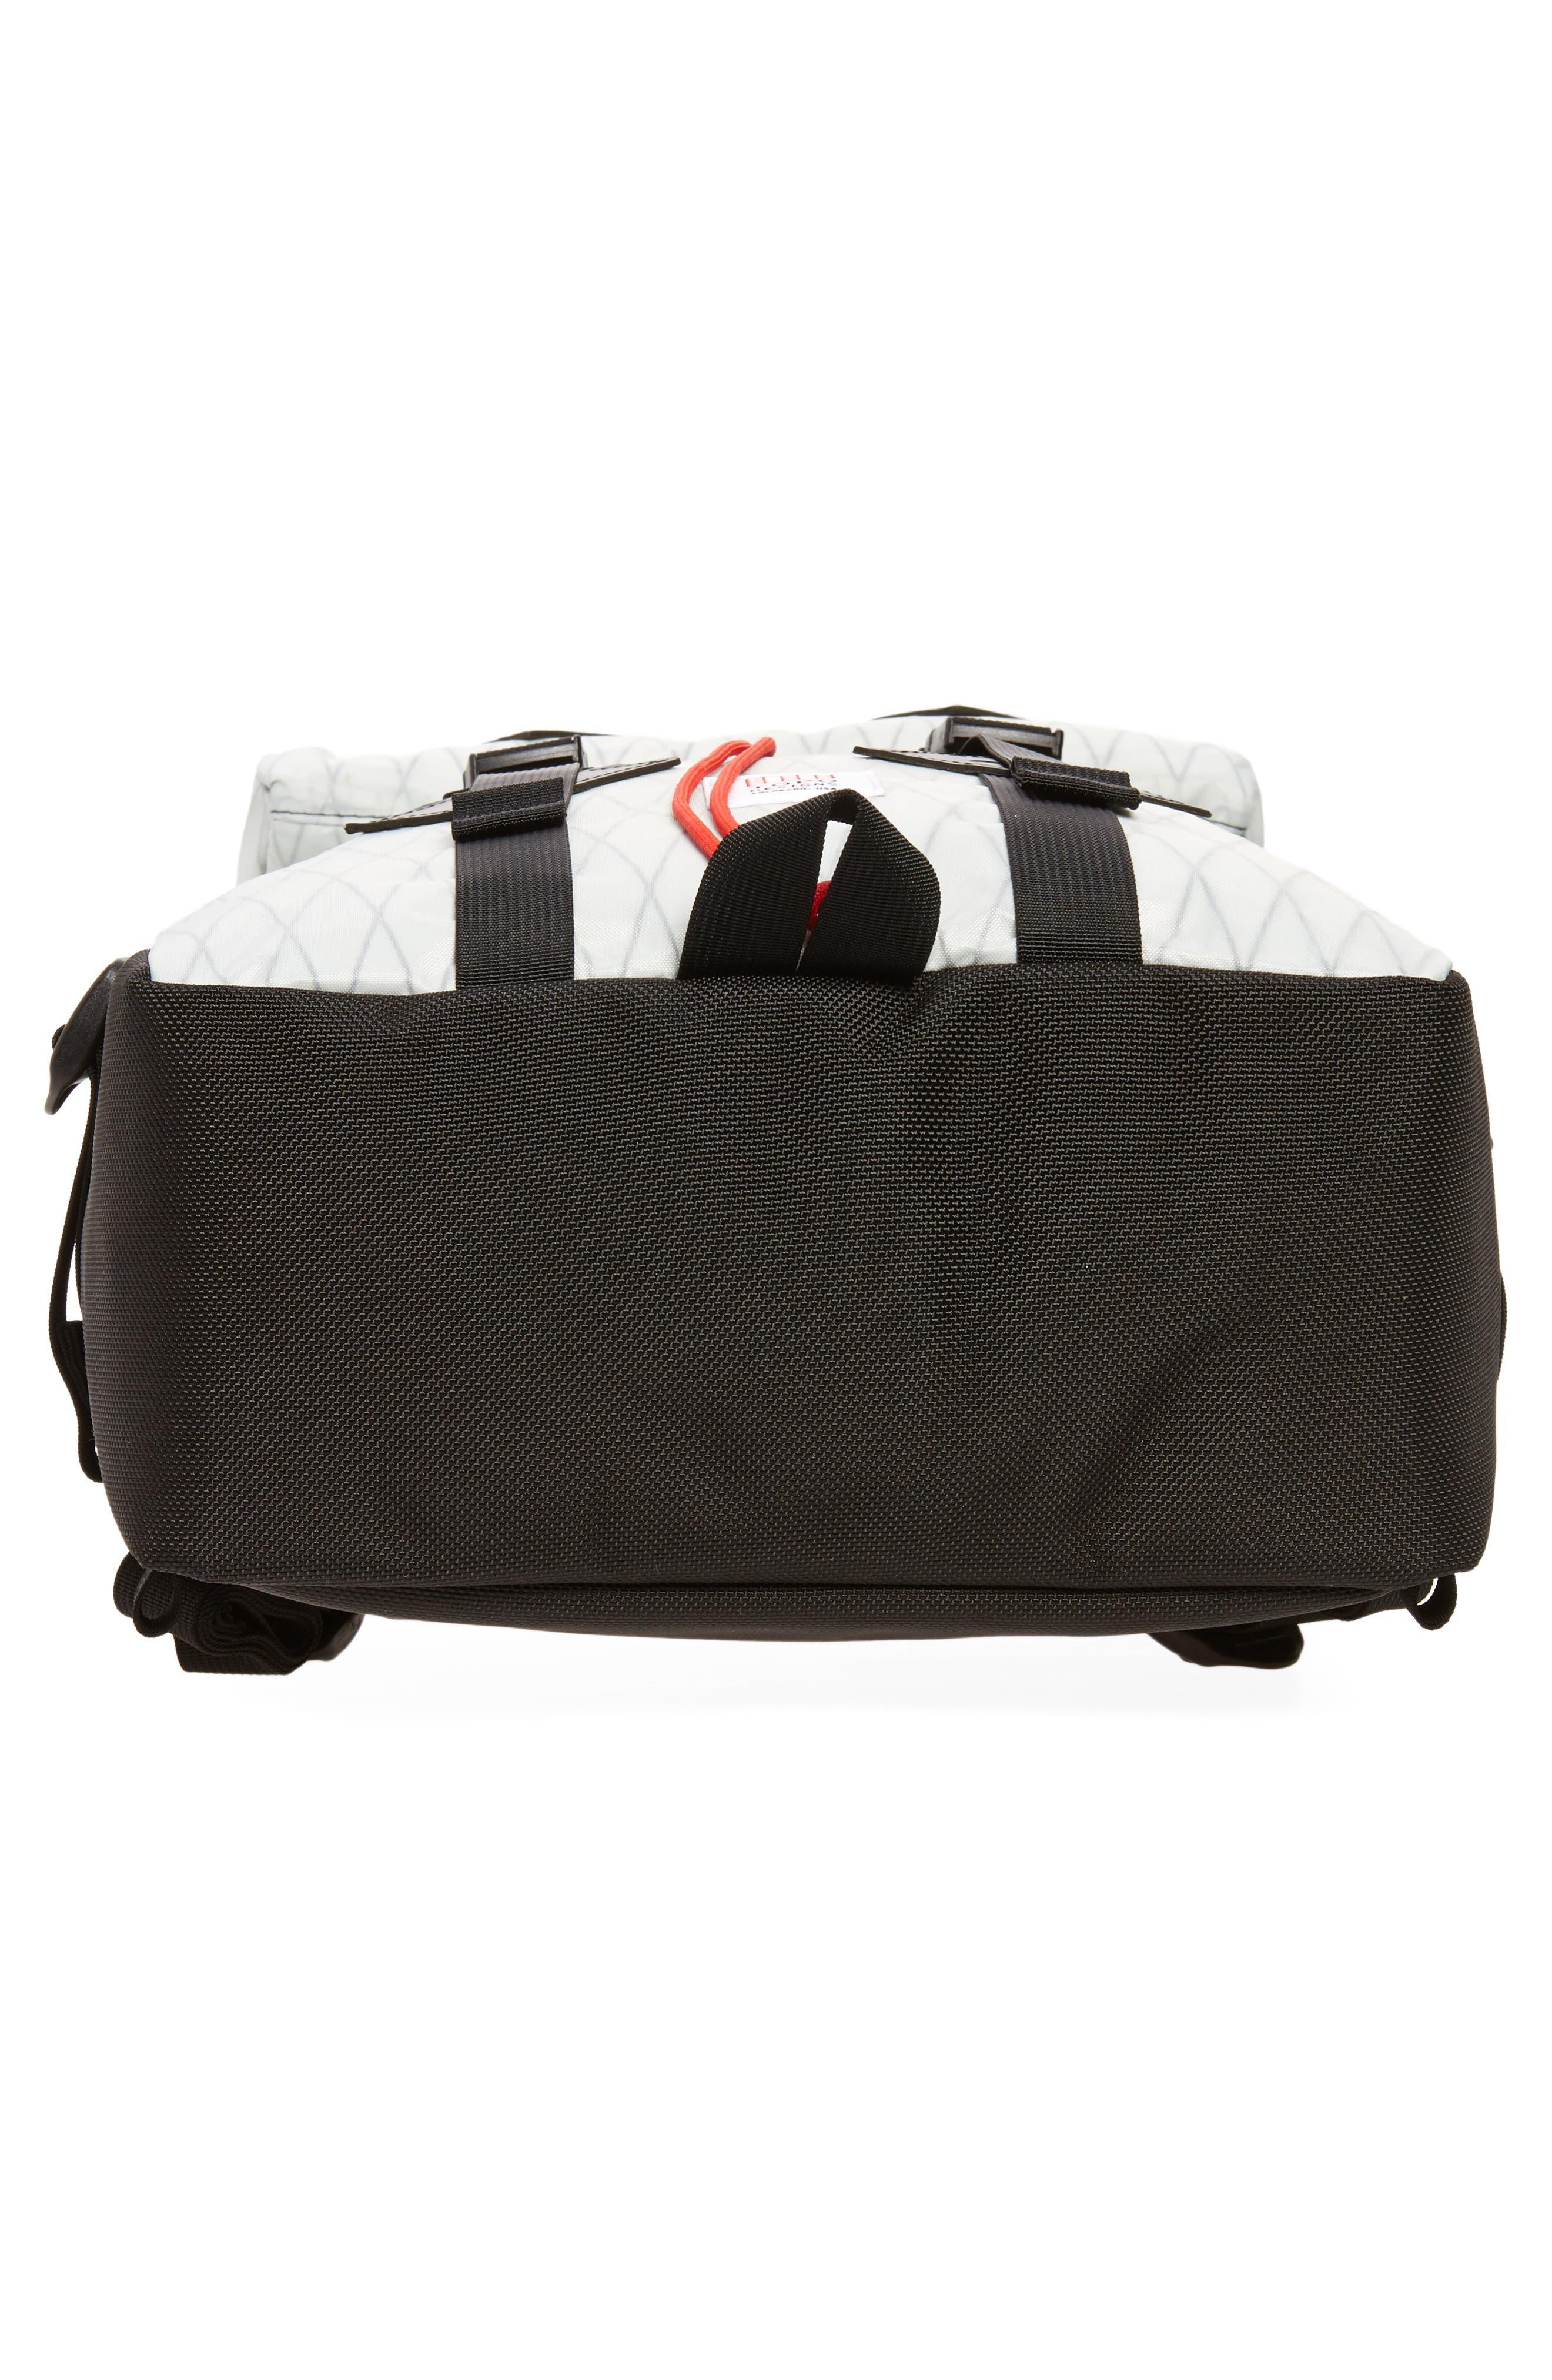 Klettersack Backpack,                             Alternate thumbnail 6, color,                             X-PACK/ BALLISTIC BLACK